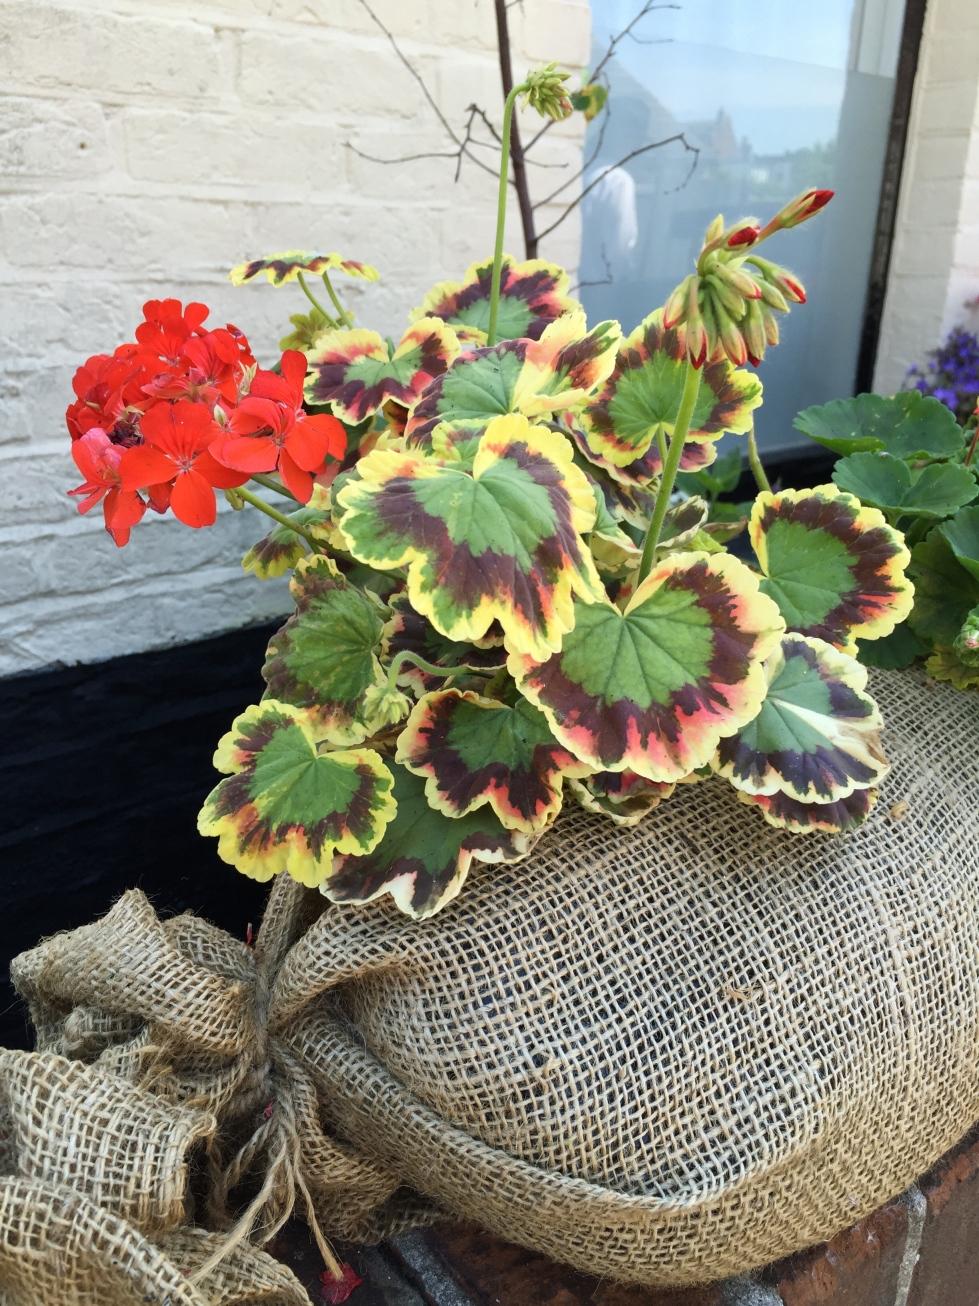 Geranium in hessian sack, Whitstable, July 2015